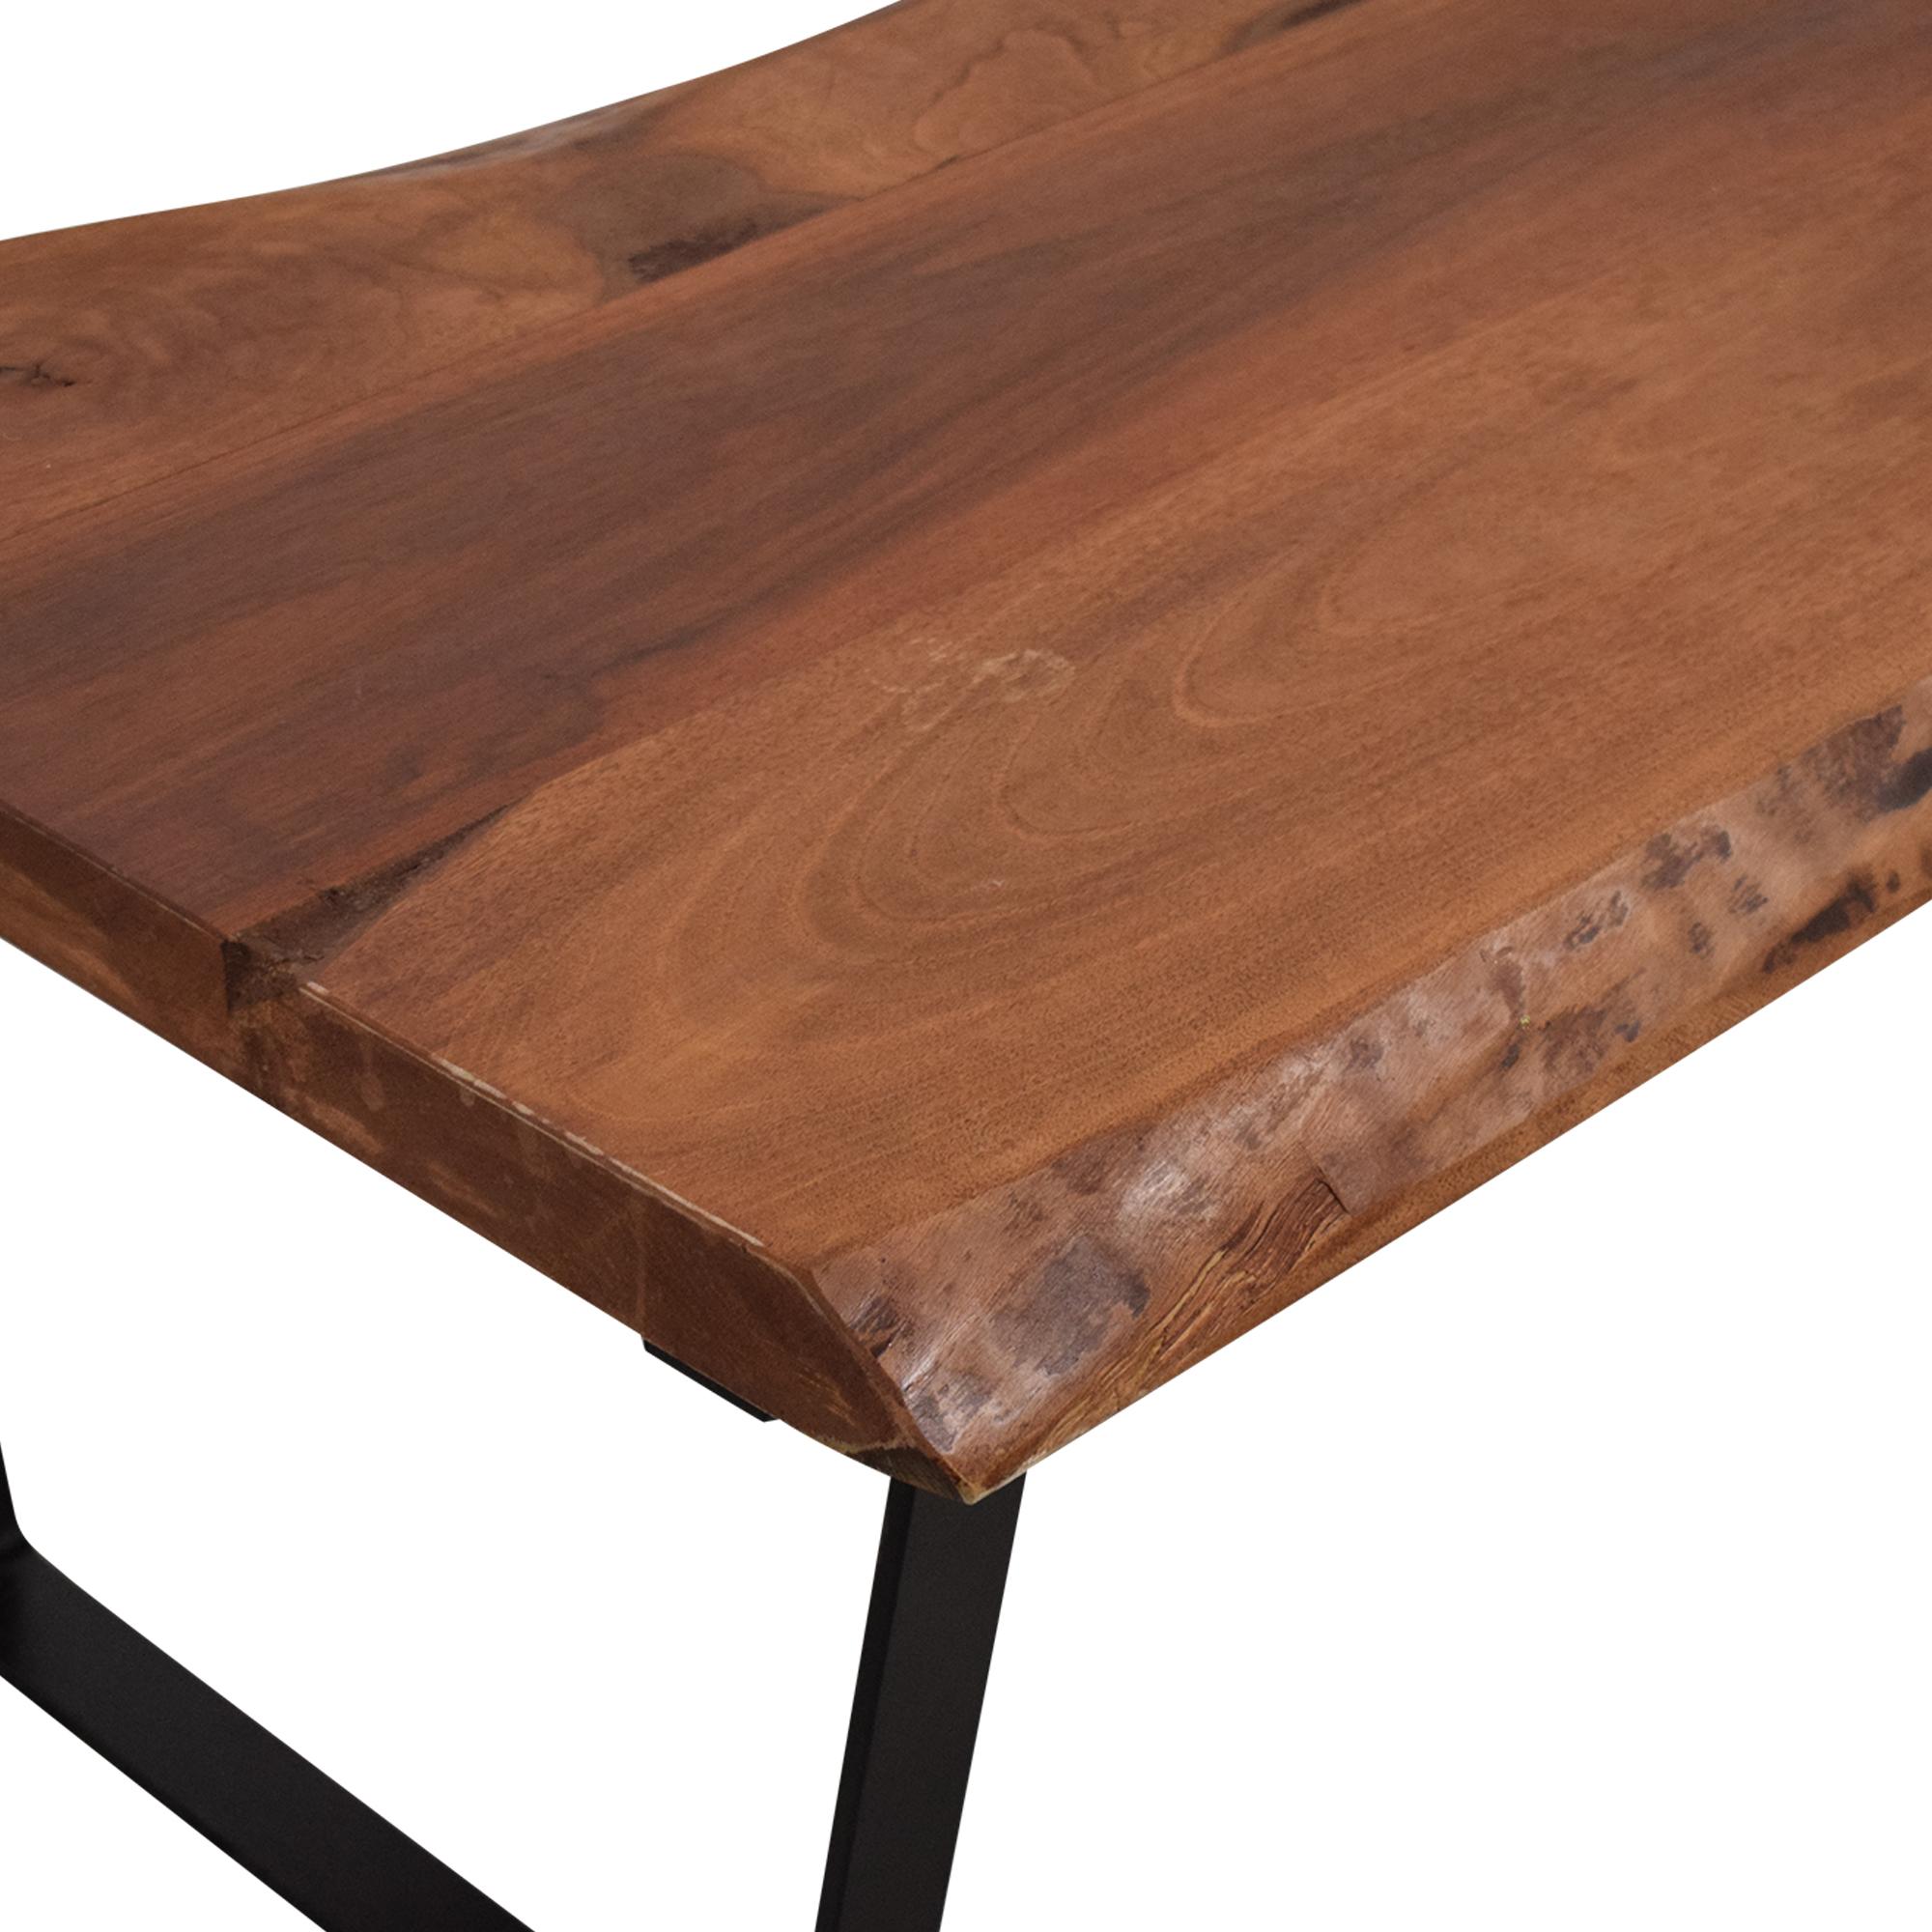 62 off modern wood coffee table on metal legs tables